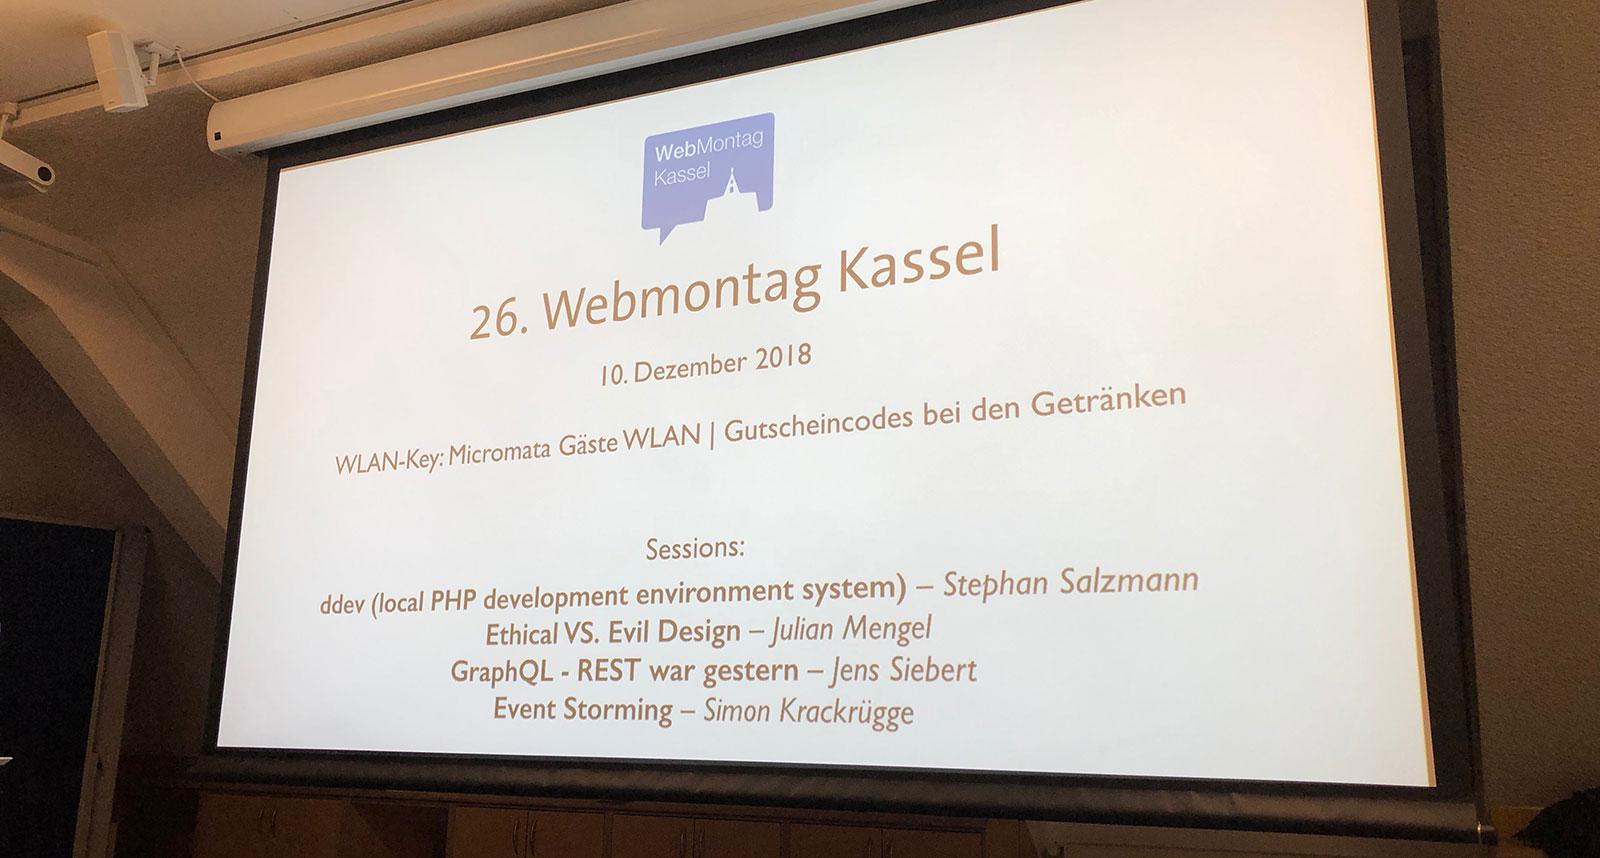 26. Webmontag Kassel